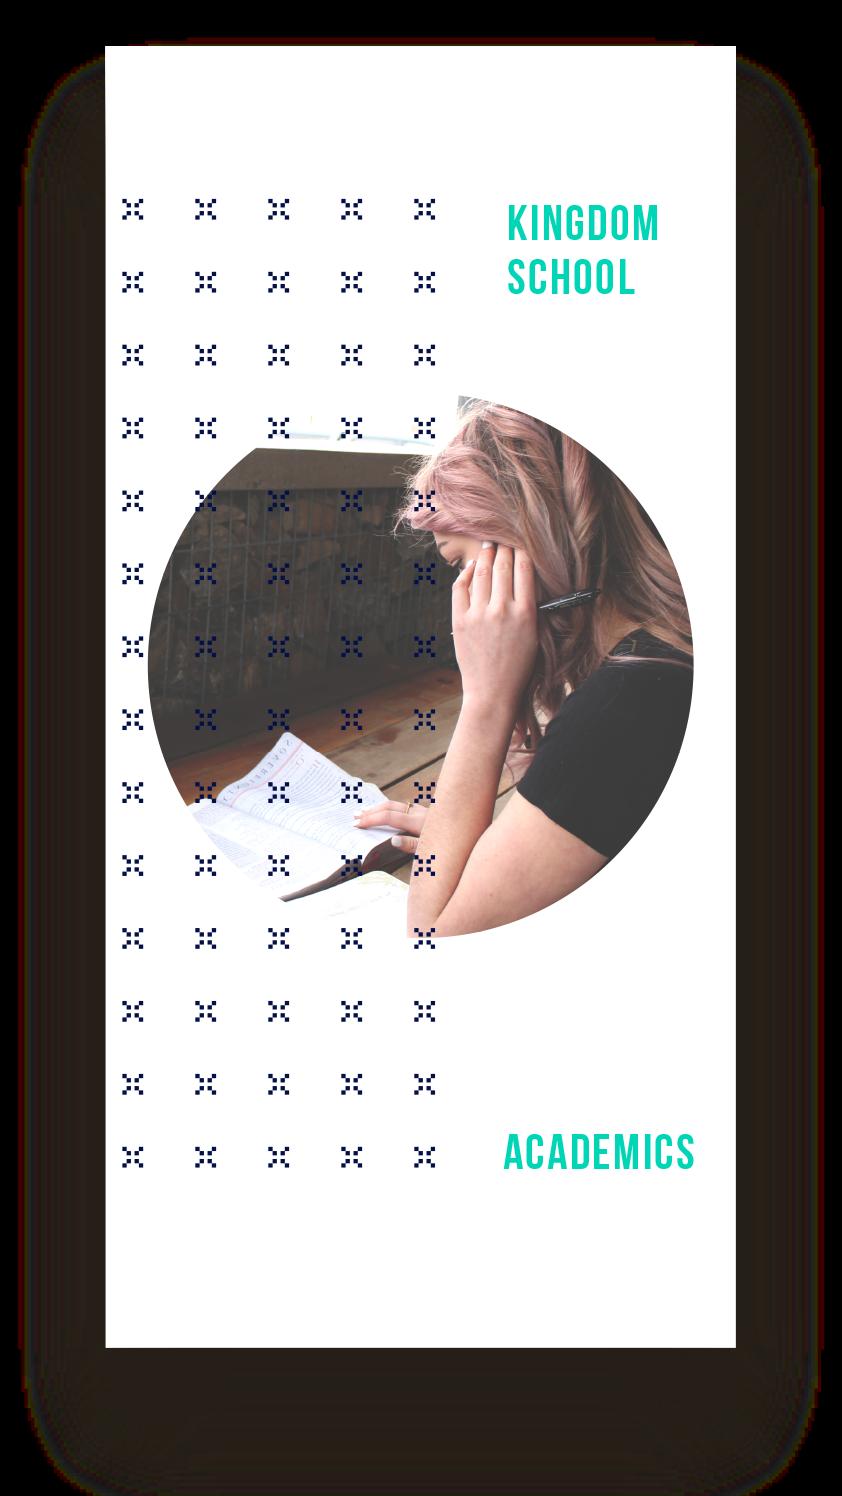 _academics image.png